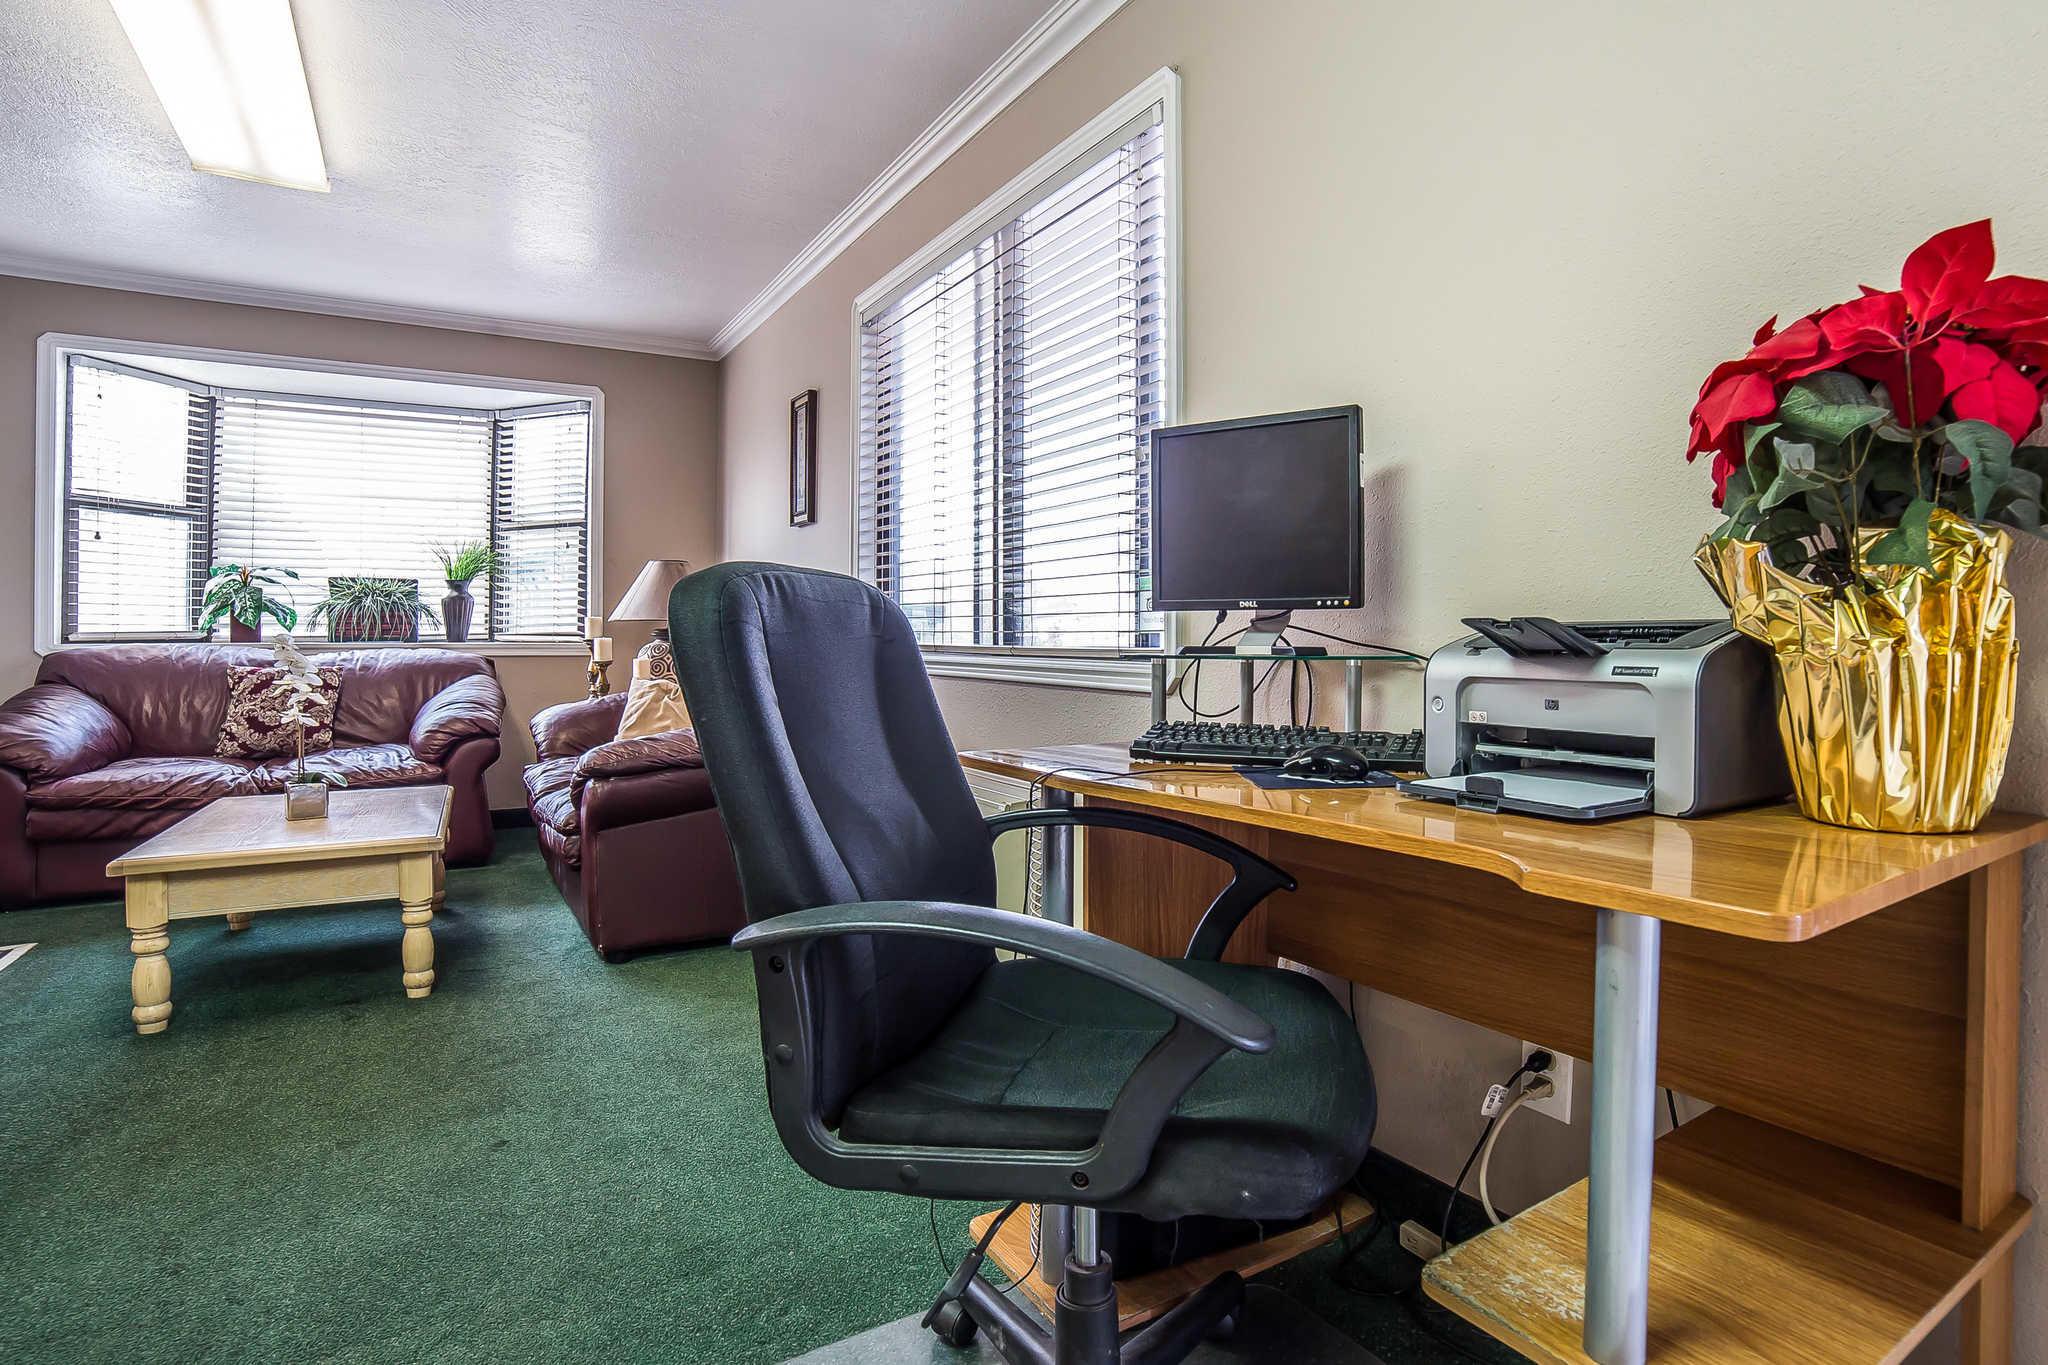 Econo Lodge Inn & Suites image 32